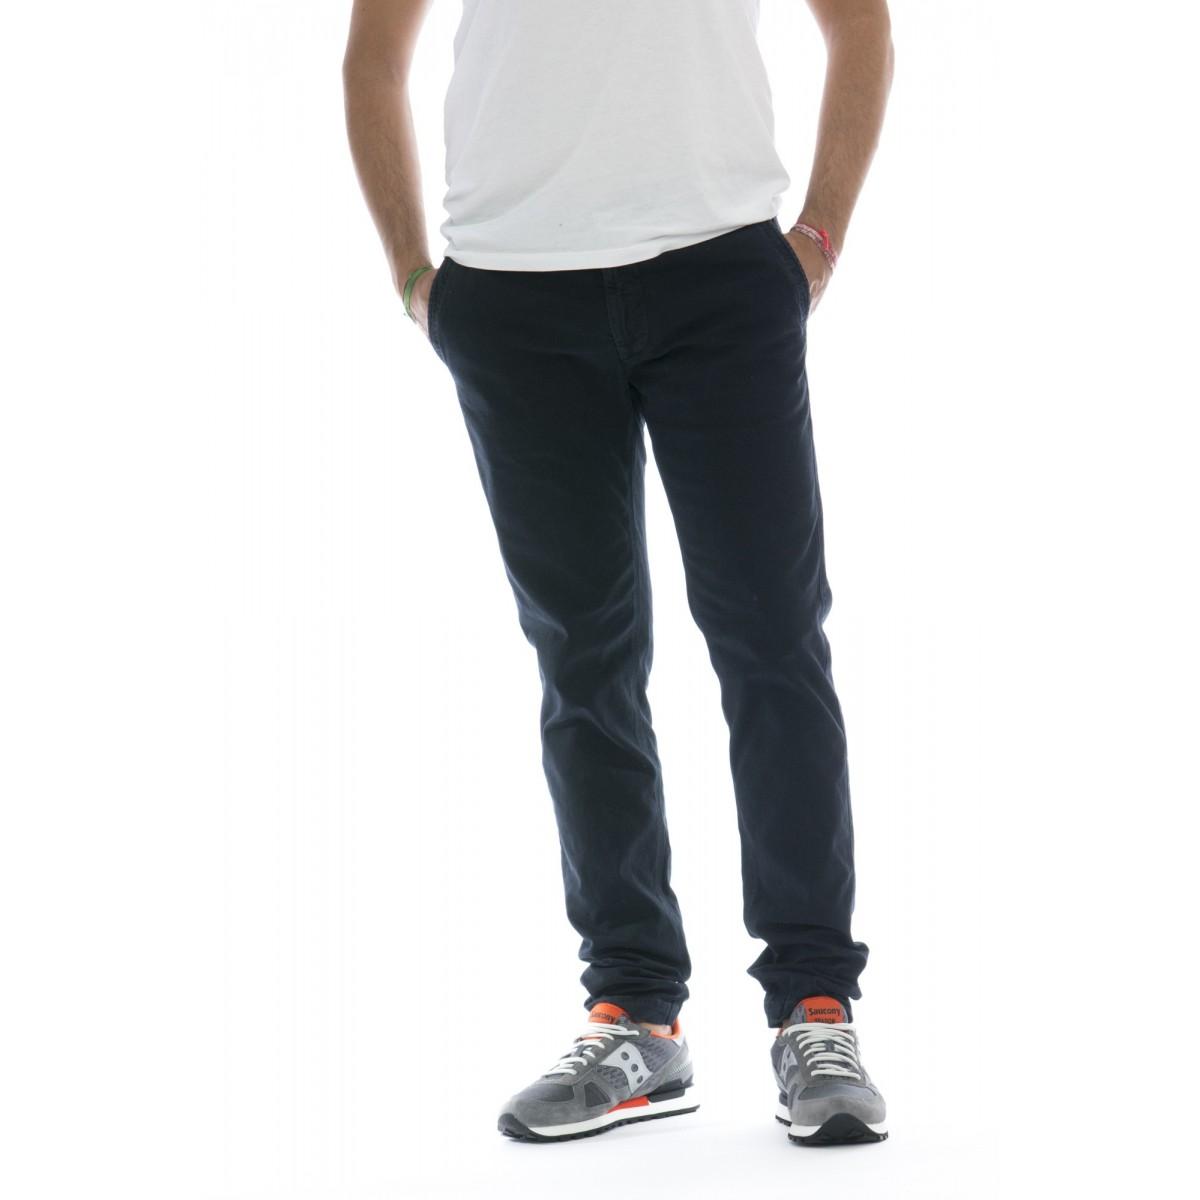 Pantaloni - 30205 pantalone slim strech cotone 98% cotone, 2% elastane